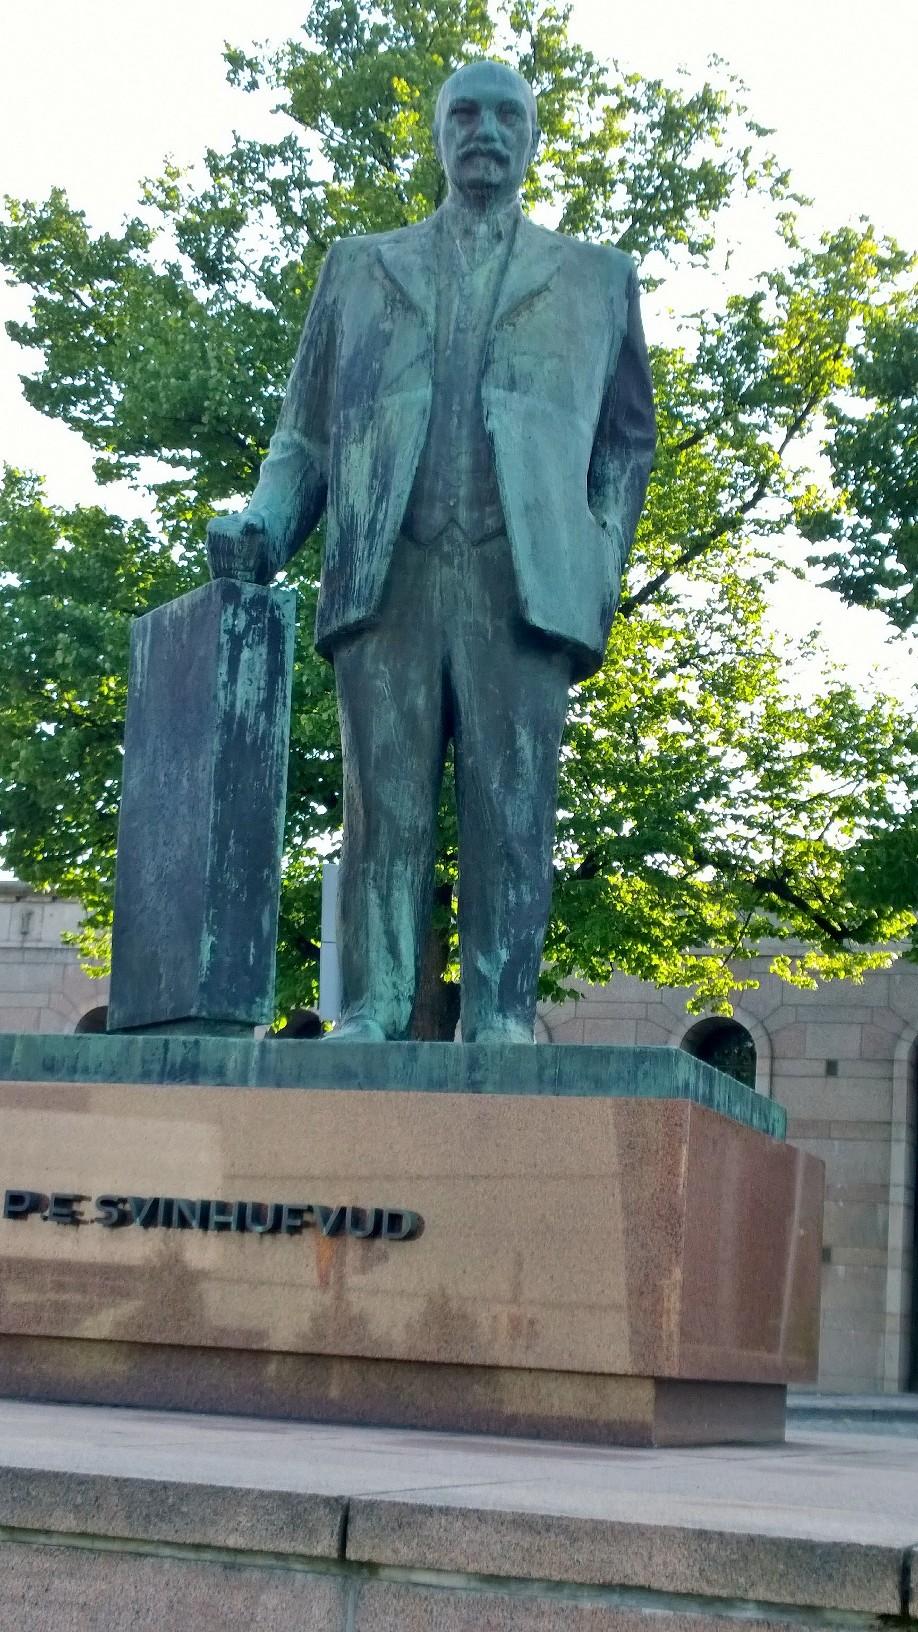 P. E. Svinhufvud